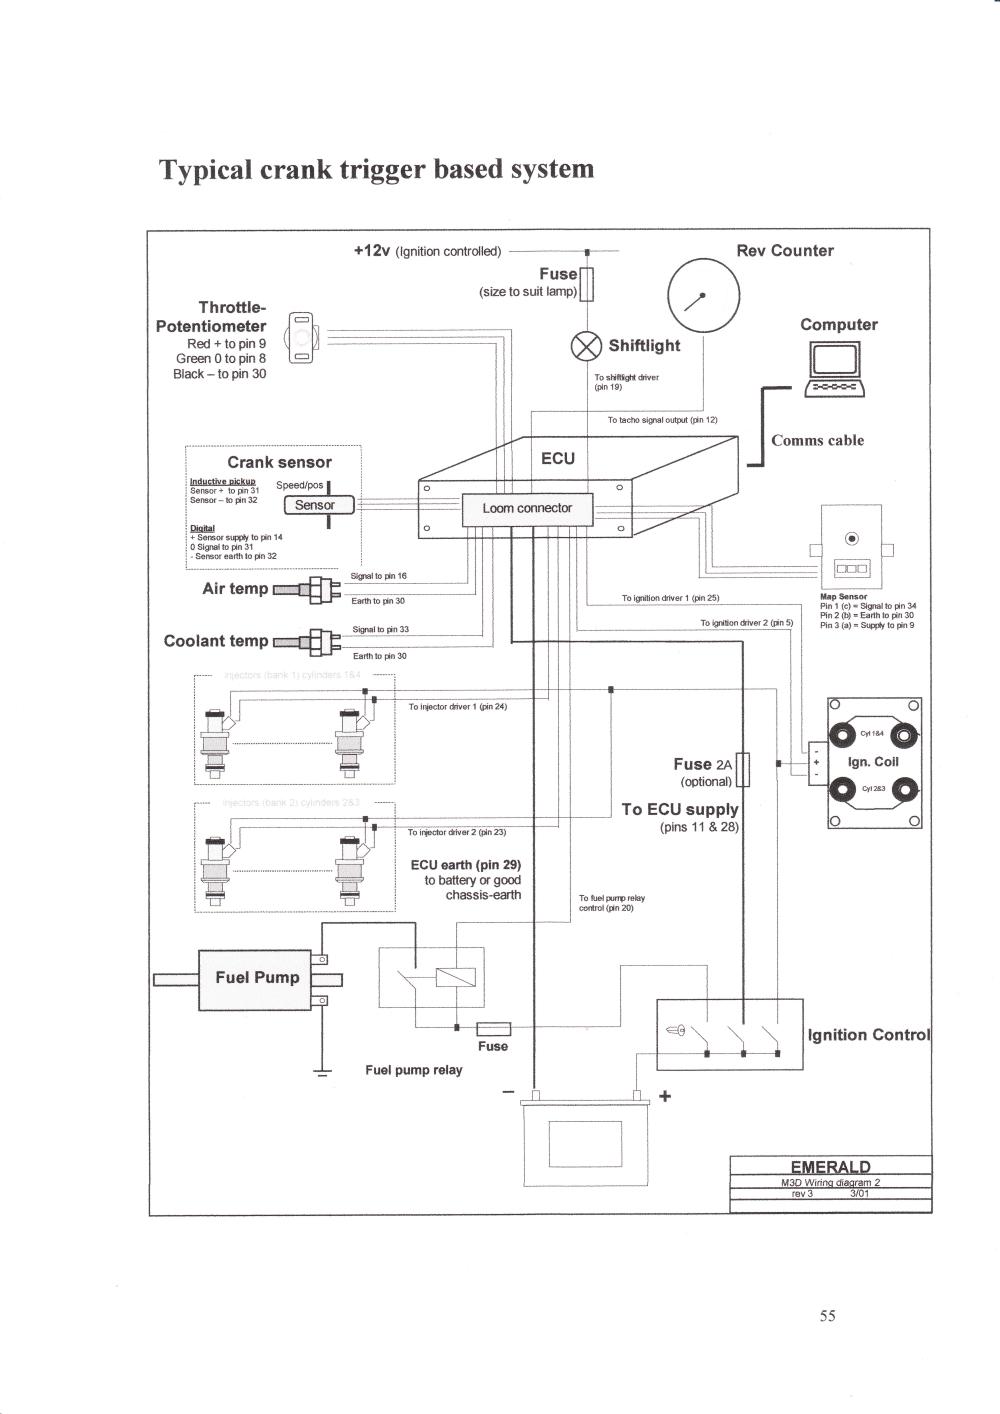 edis 4 wiring diagram 2004 dodge stratus o2 sensor mk1 escort 6 dial clocks - rev counter